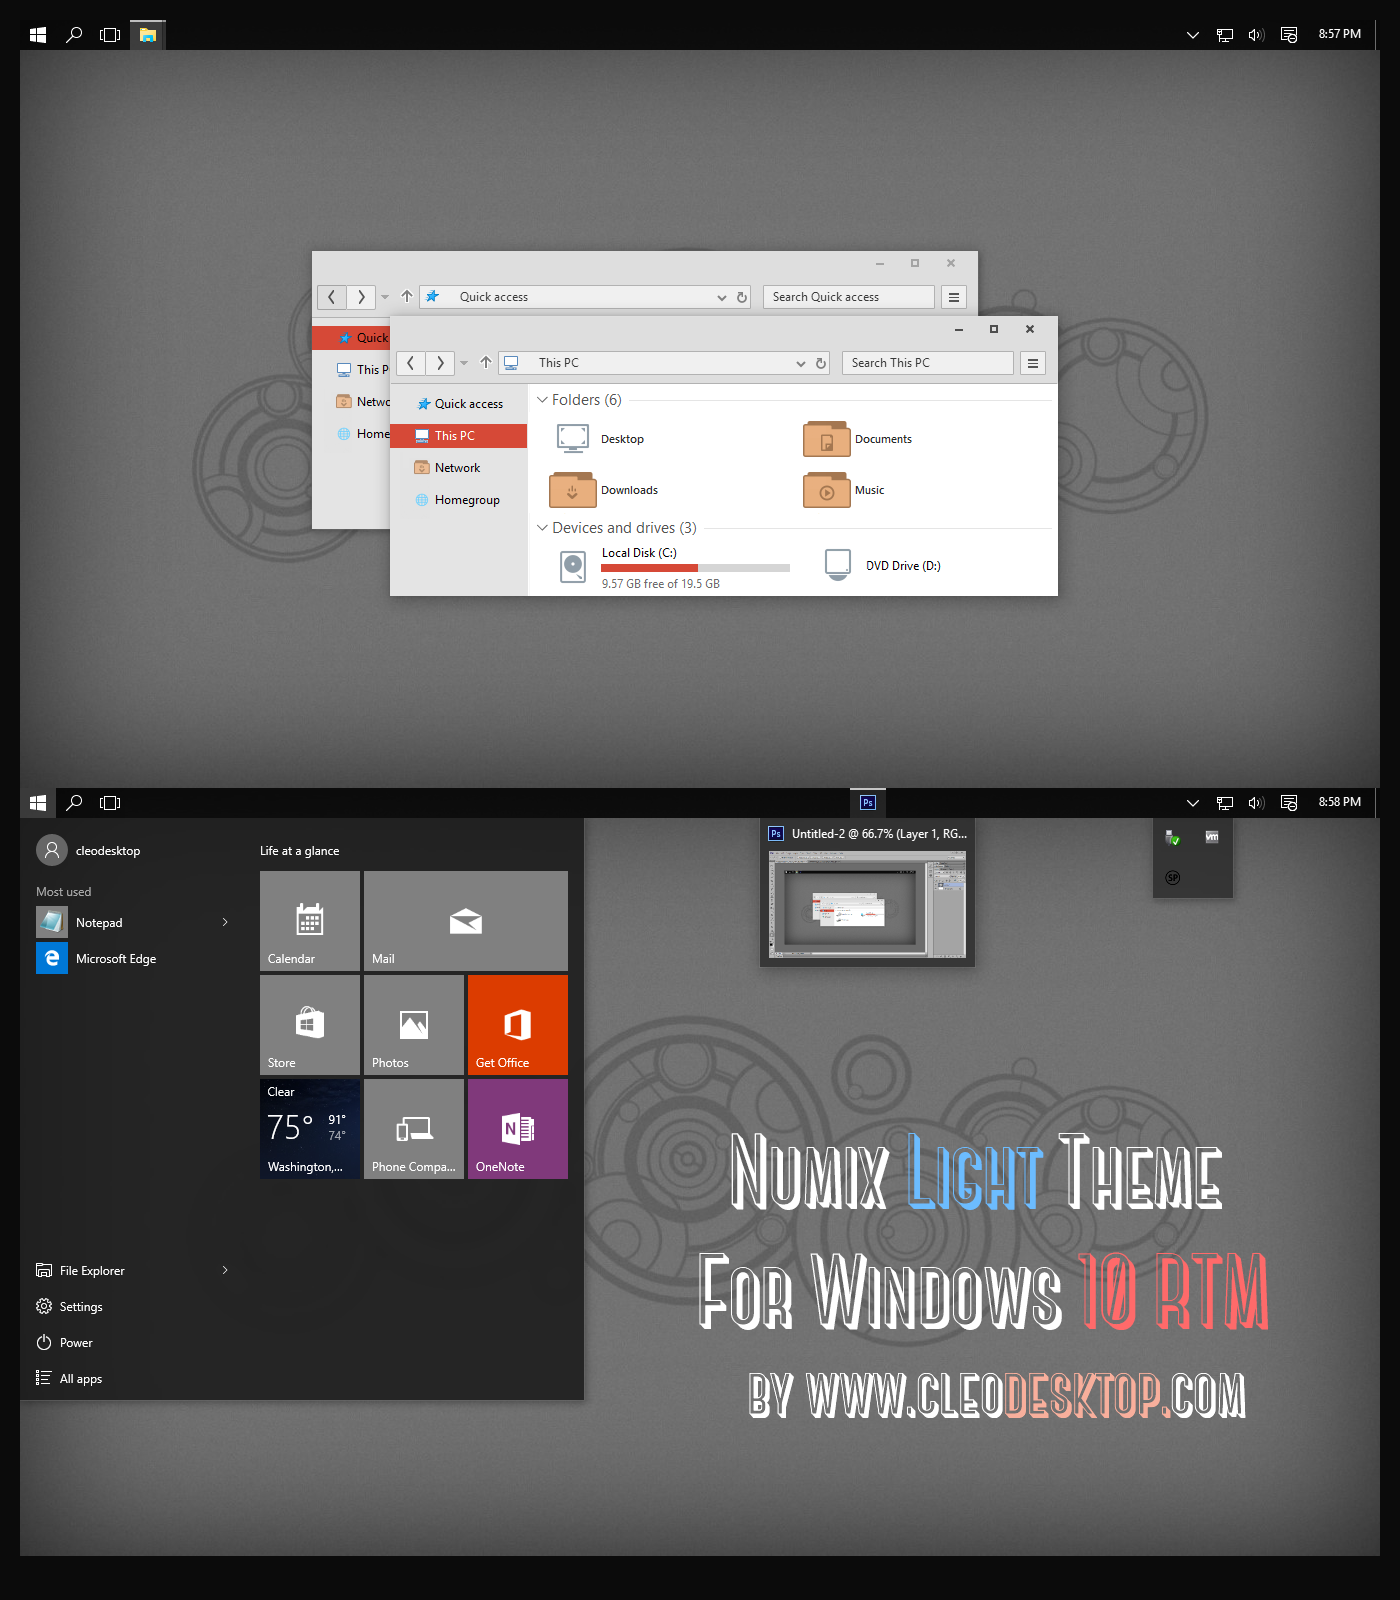 Numix Light Theme For Windows 10 RTM Adobe illustrator